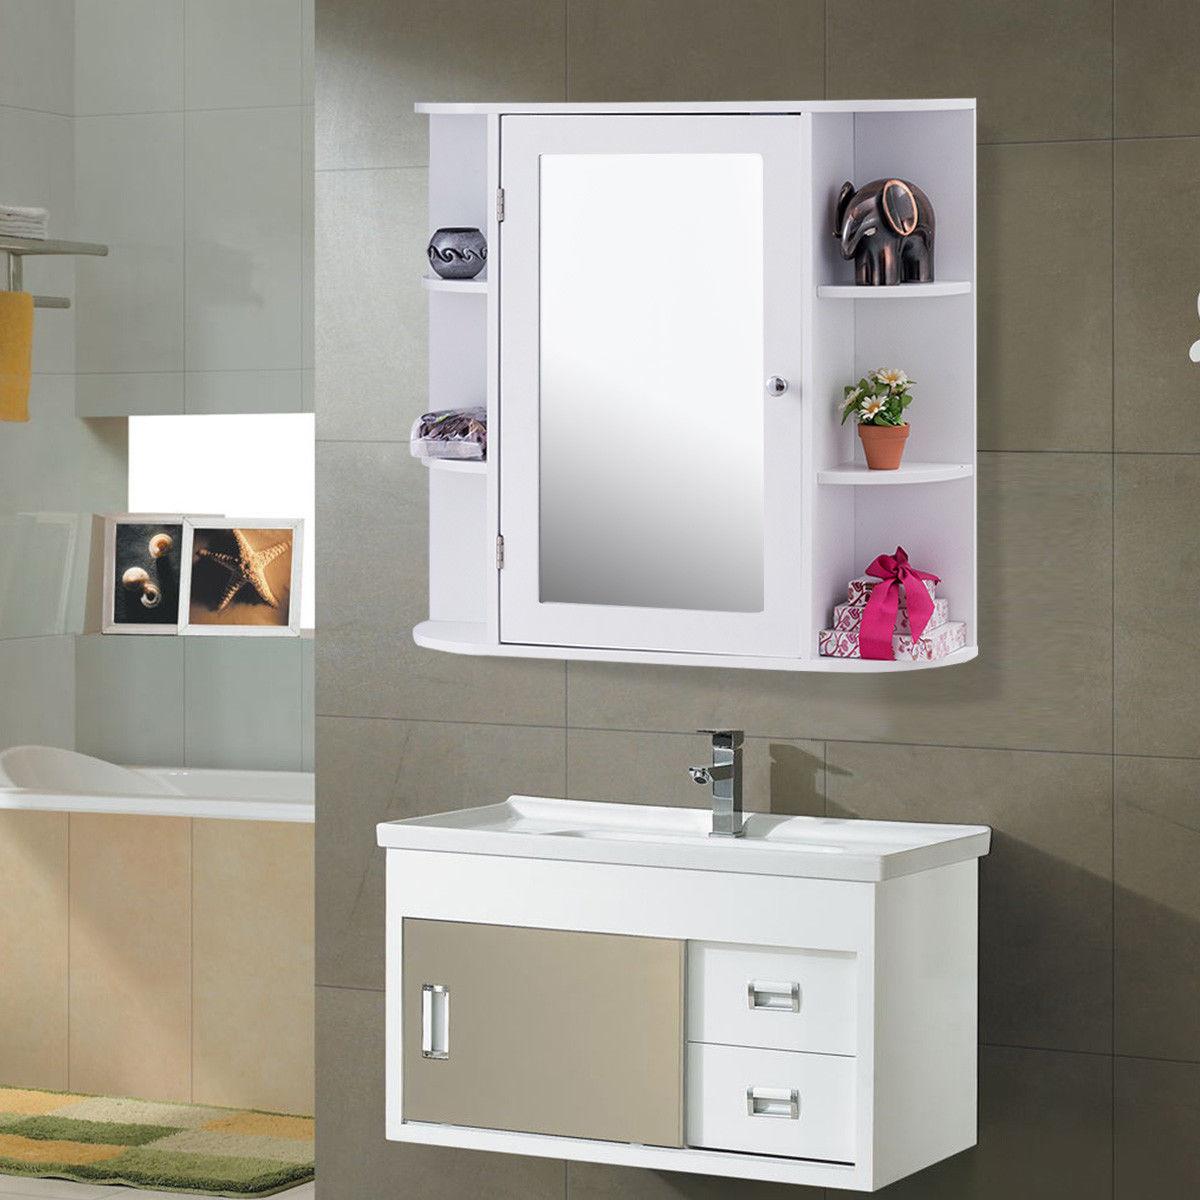 Us 12599 Giantex Multipurpose Mount Wall Surface Bathroom Storage Cabinet With Mirror White Modern Wood Bathroom Furniture Hw56729 On regarding size 1200 X 1200